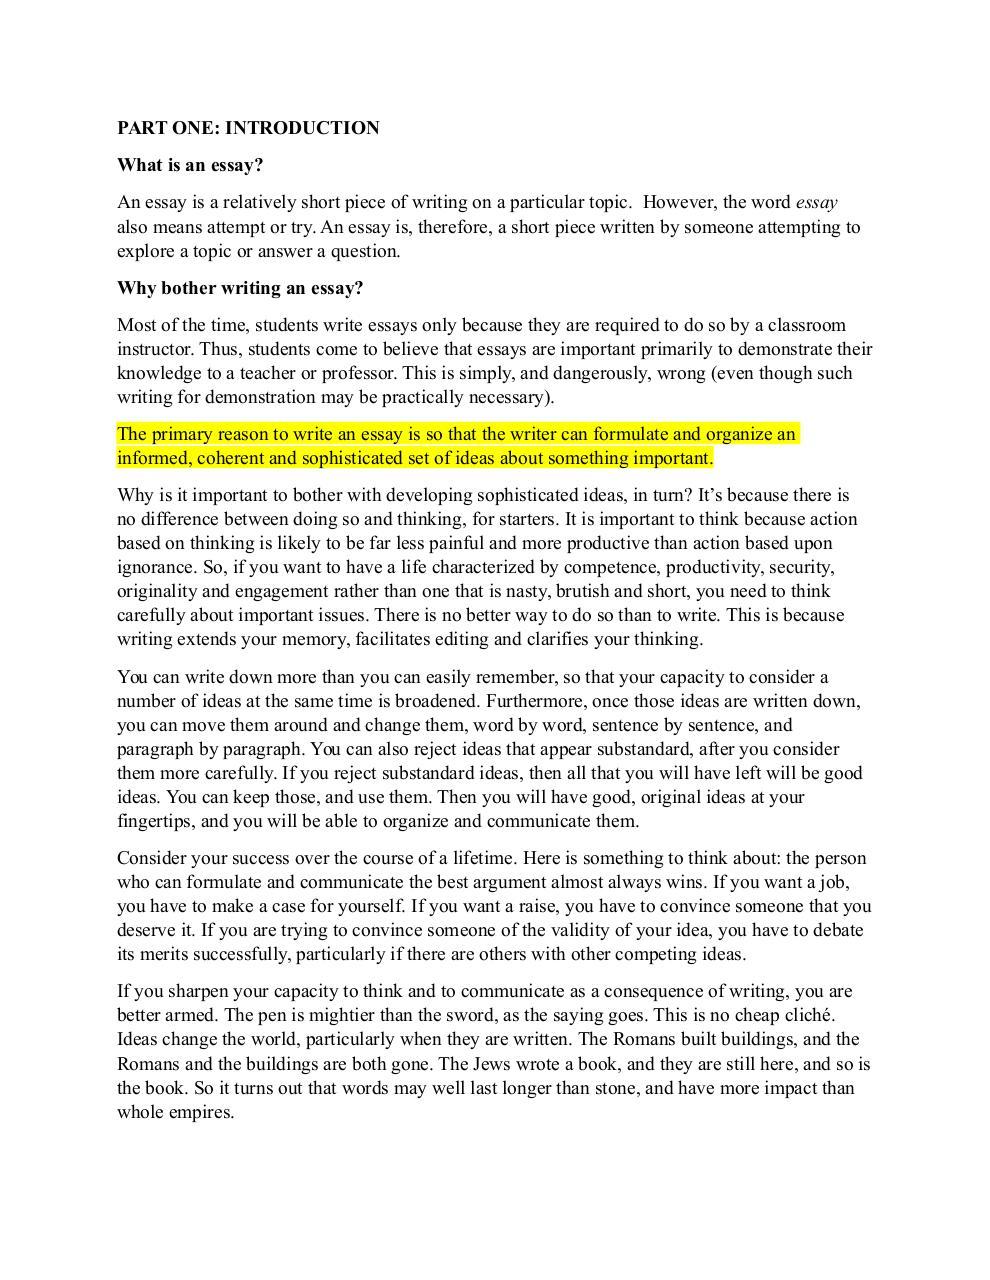 jordan peterson essay pdf